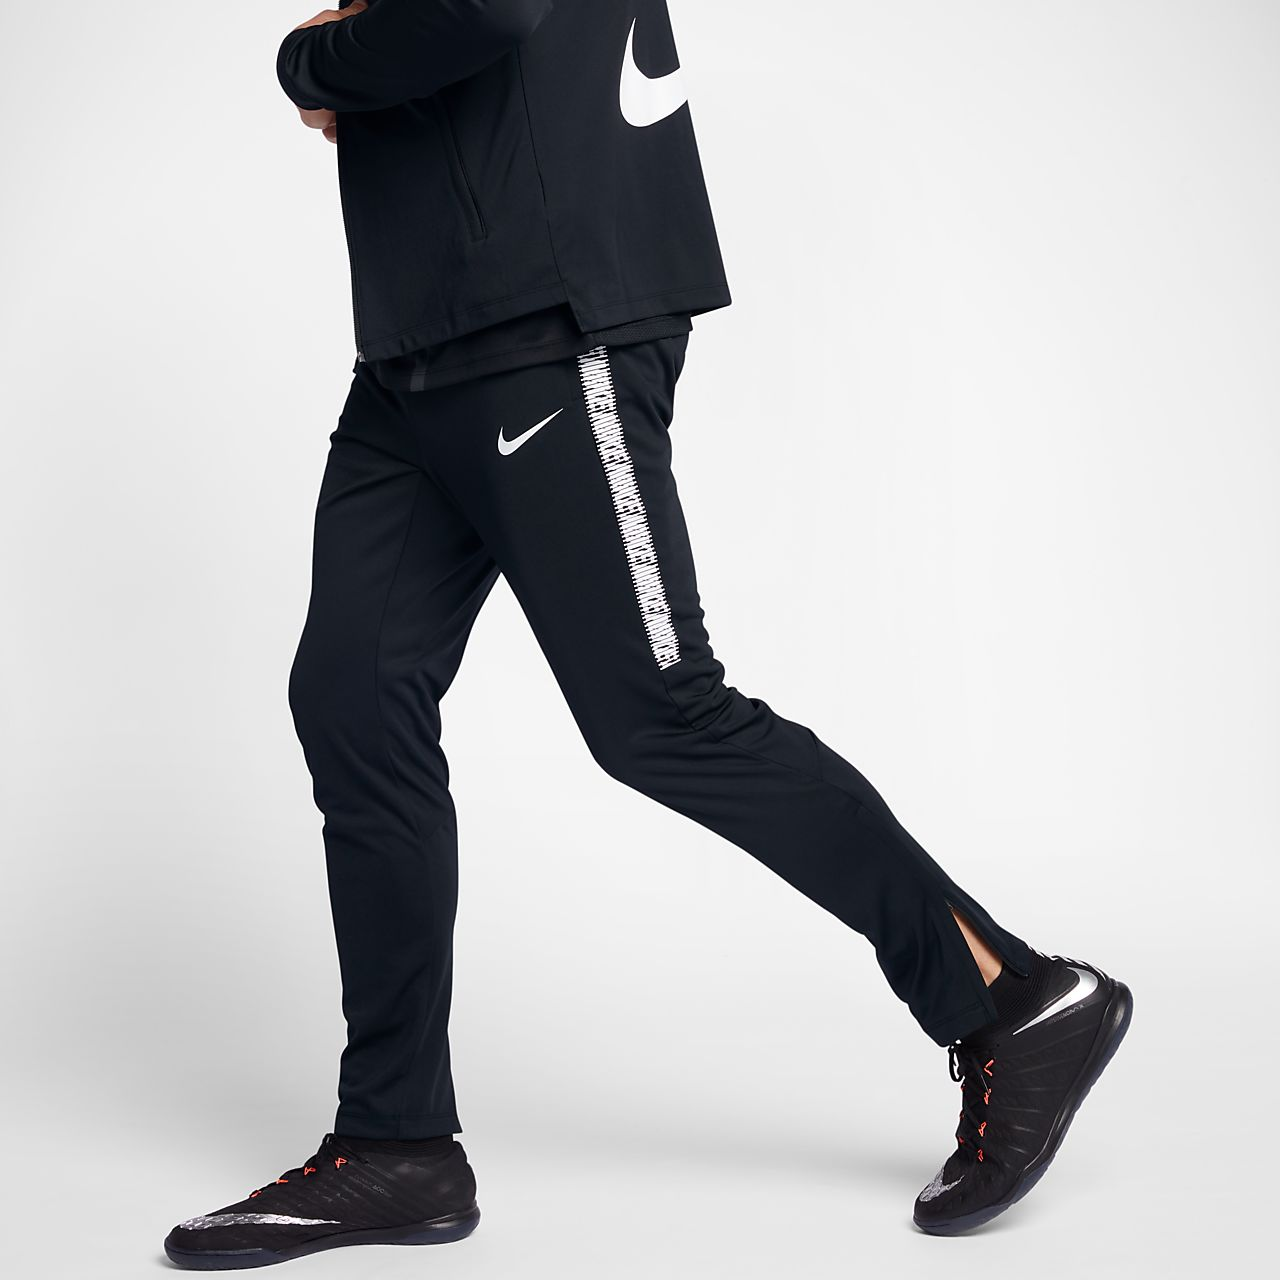 ... Nike Dri-FIT Squad Men's Football Track Suit